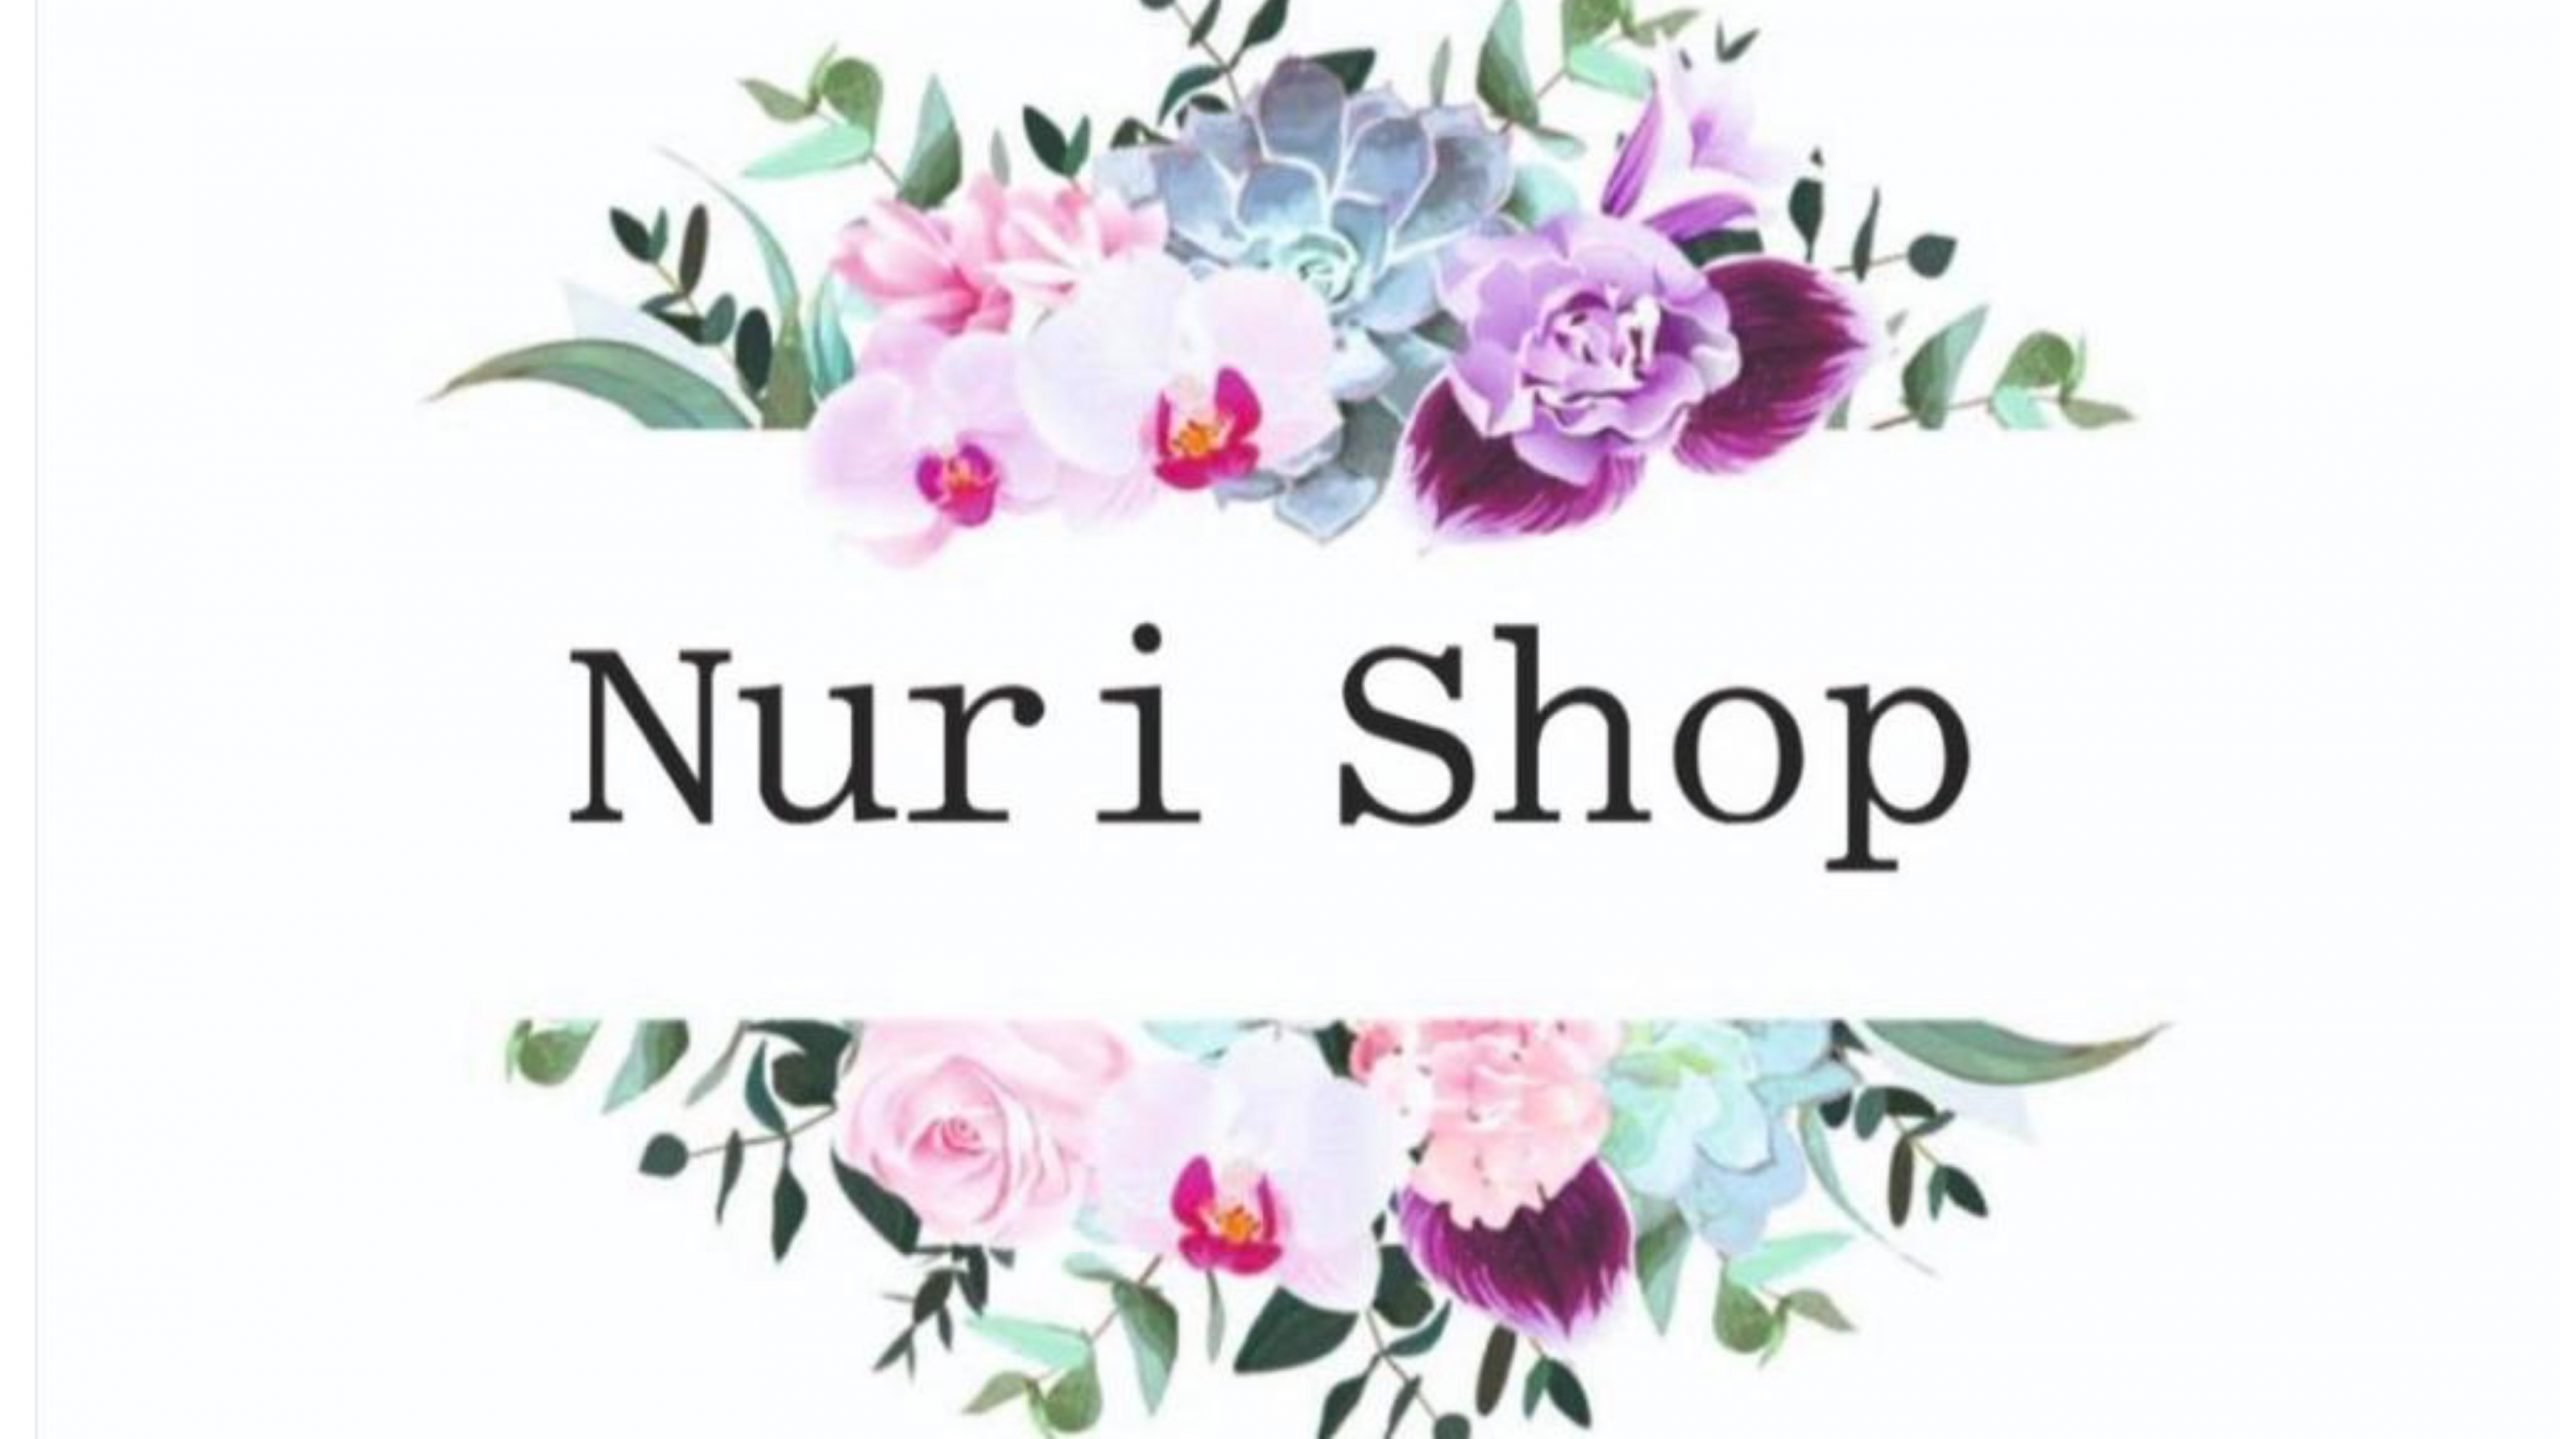 Nuri Shop